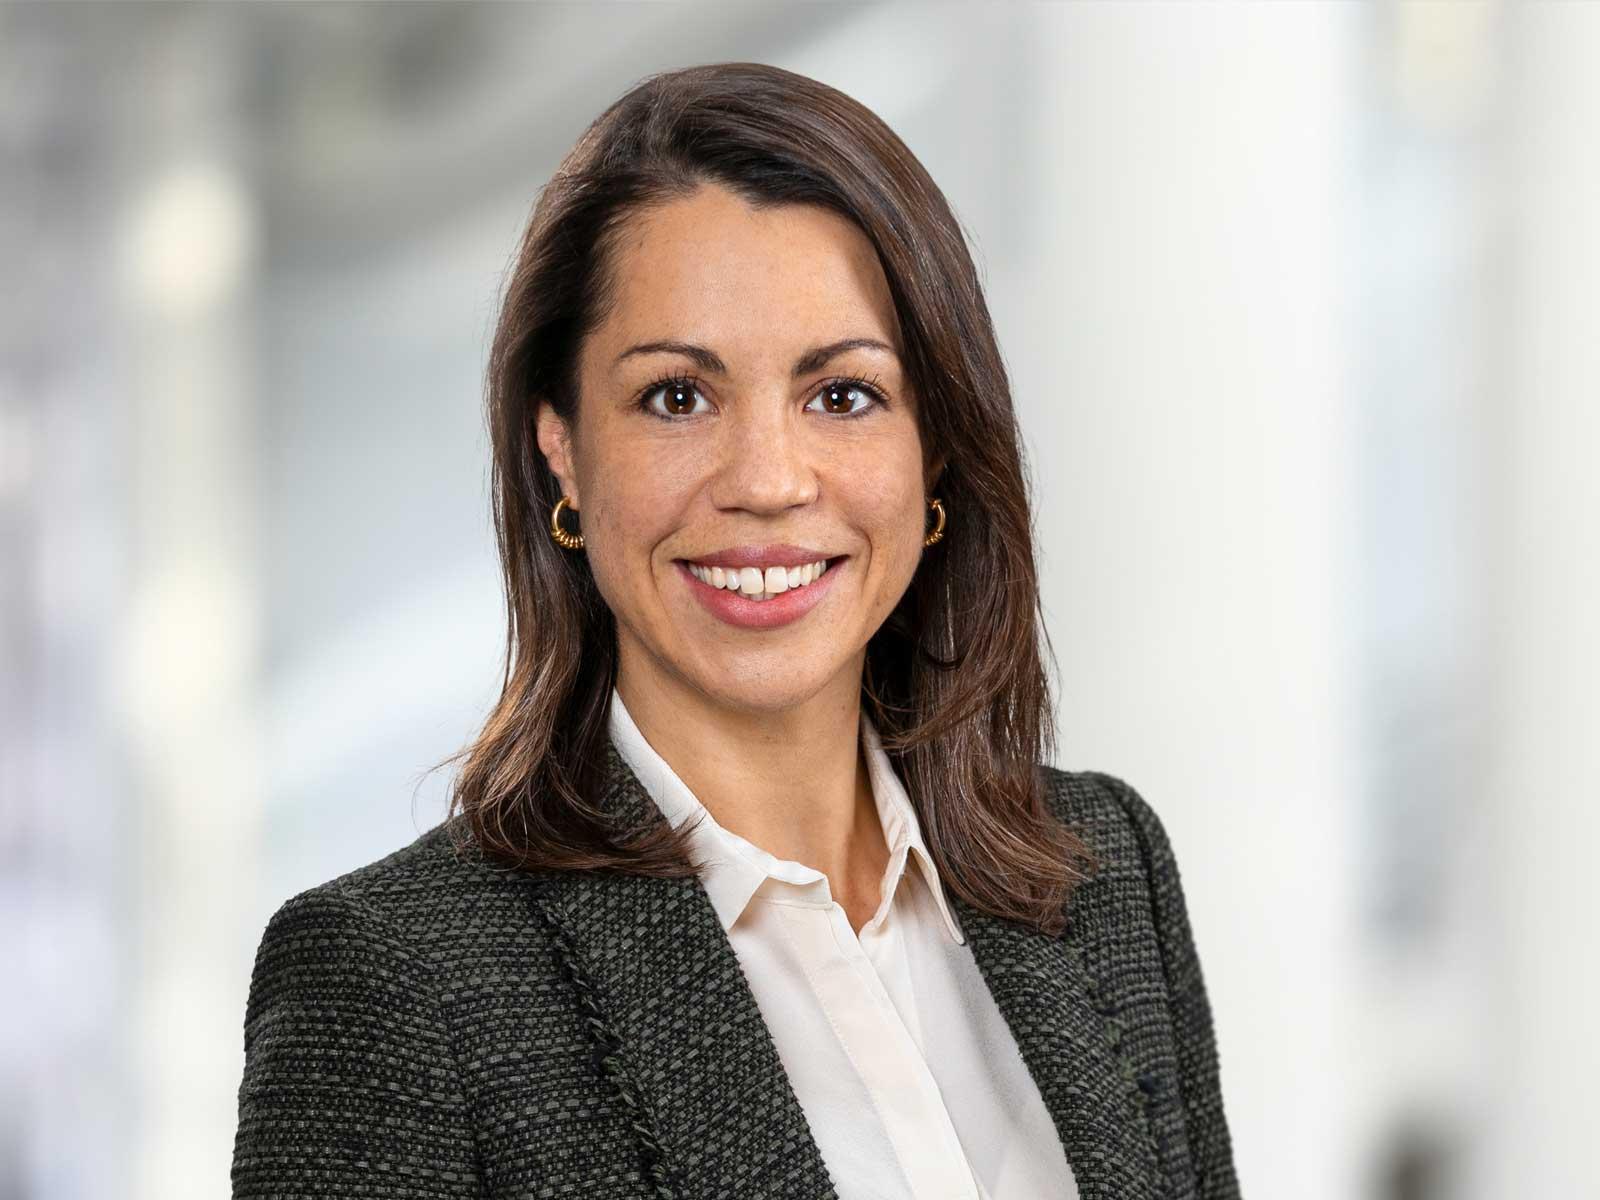 Kardiocentrum Frankfurt Dr. med. Christina Wiesenbach